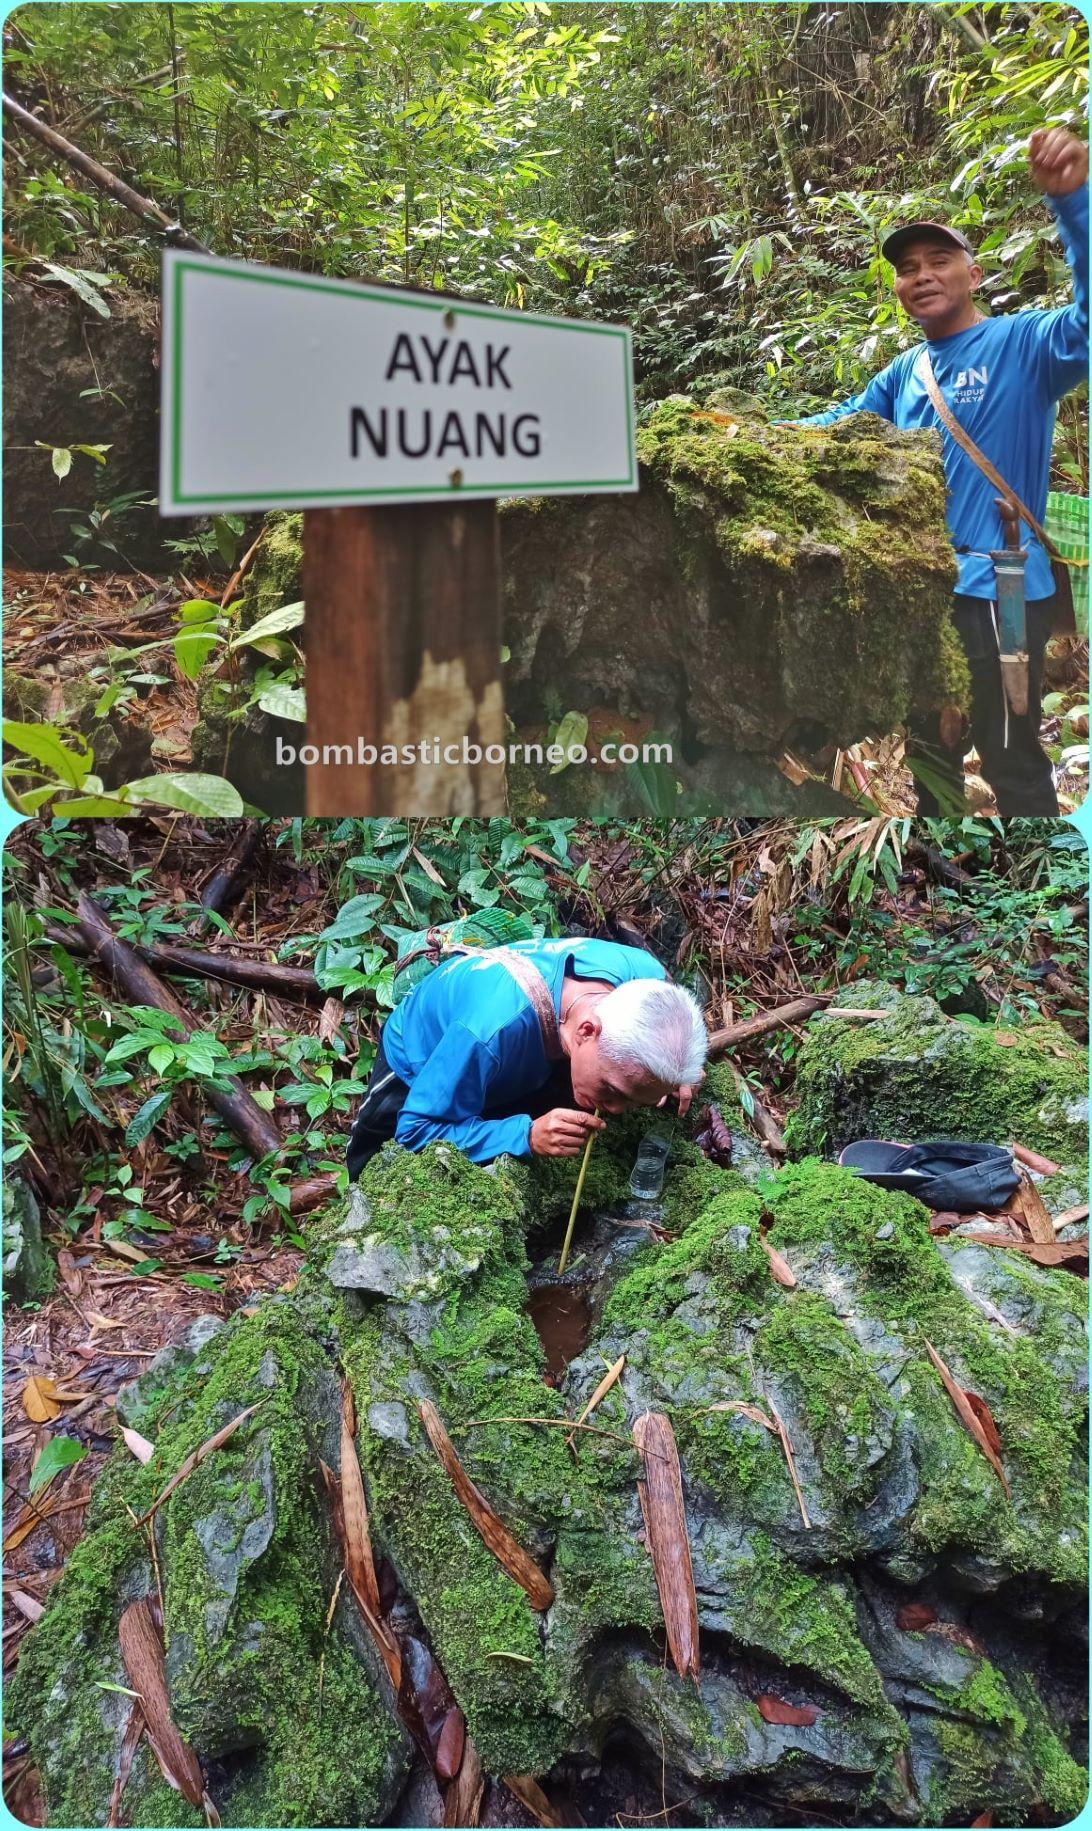 rainforest Kampung Gayu, Serumah village, adventure, nature, outdoor, hiking, exploration, Padawan, Malaysia, tourist attraction, Borneo, 探索婆罗洲砂拉越, 马来西亚自然生态, 古晋丛林徒步